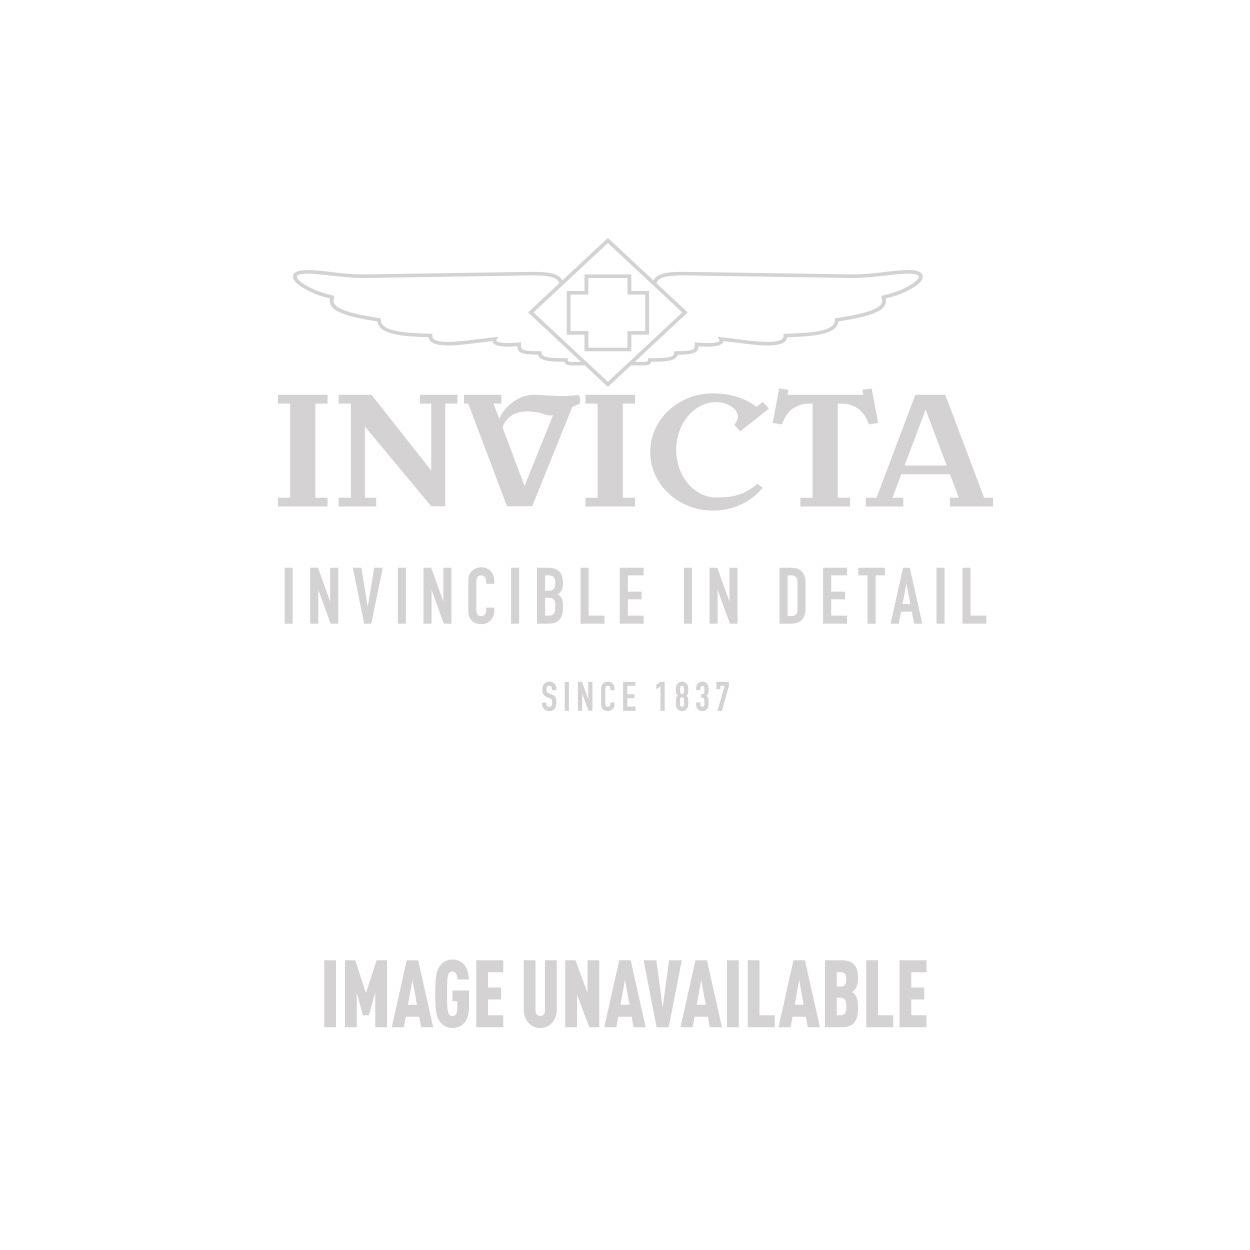 Invicta Venom Swiss Made Quartz Watch - Gold, Titanium case with Gold, Black tone Stainless Steel, Polyurethane band - Model 16311